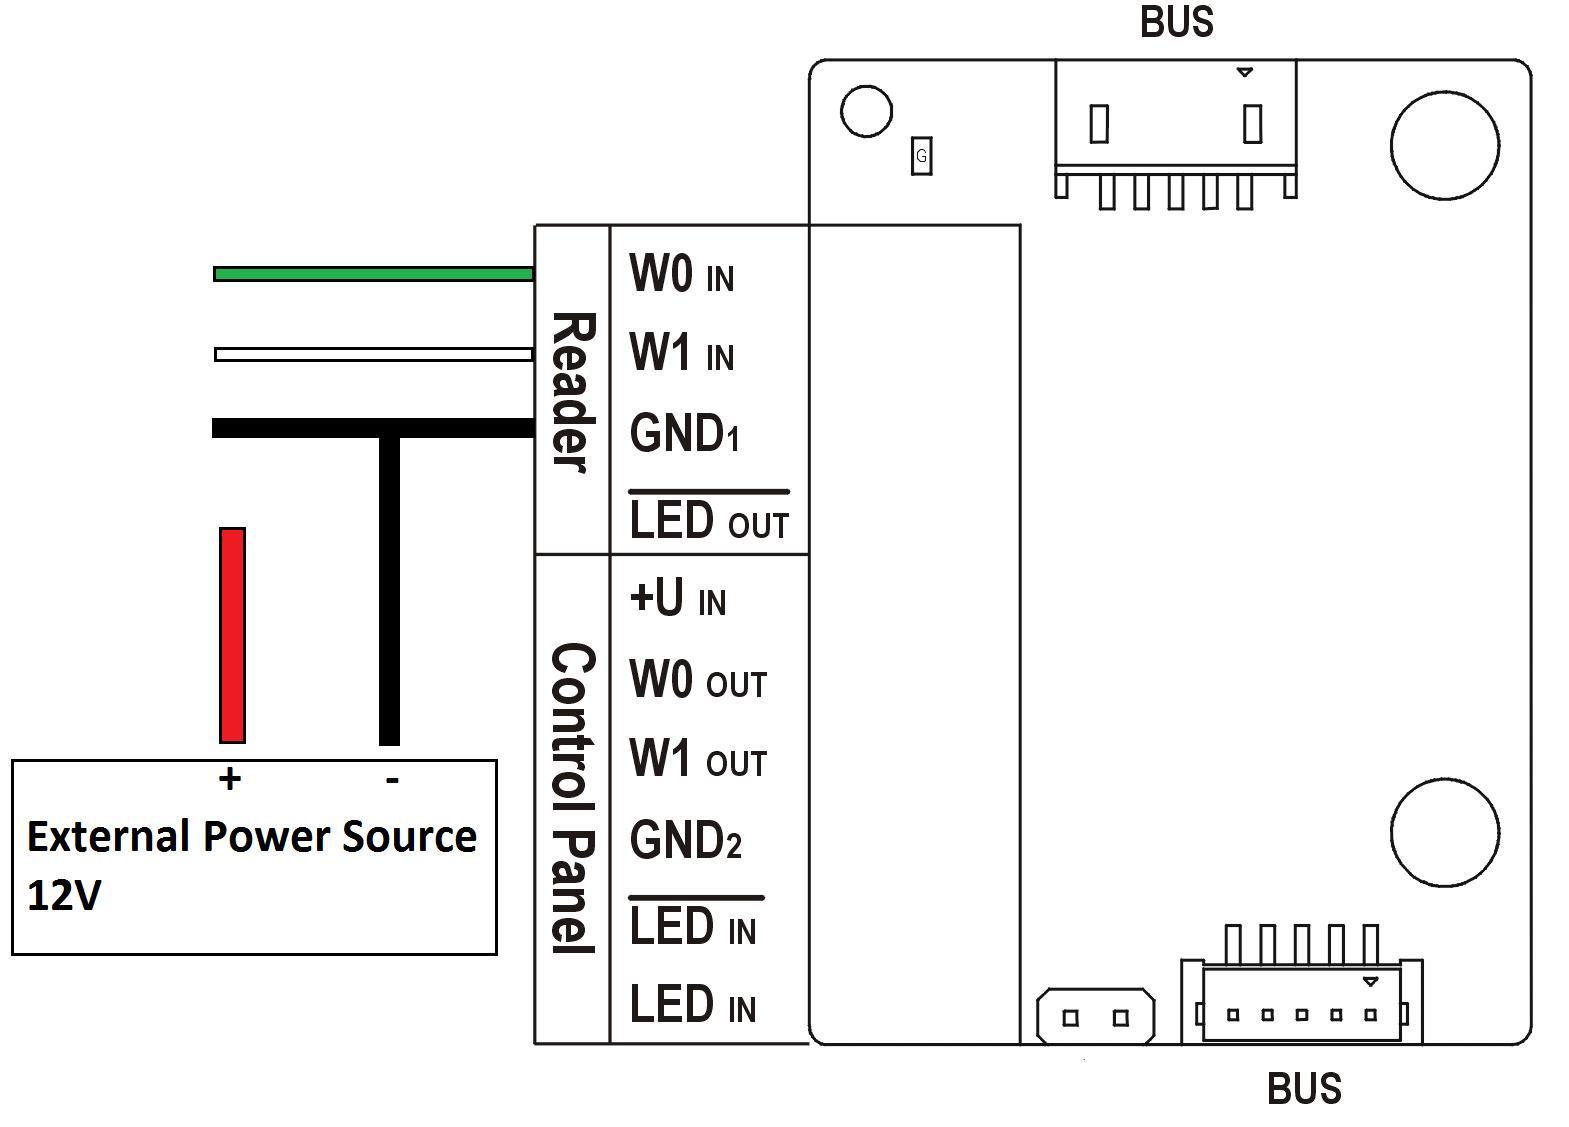 Wiegand Wiring Diagram - Wiring Diagram Library